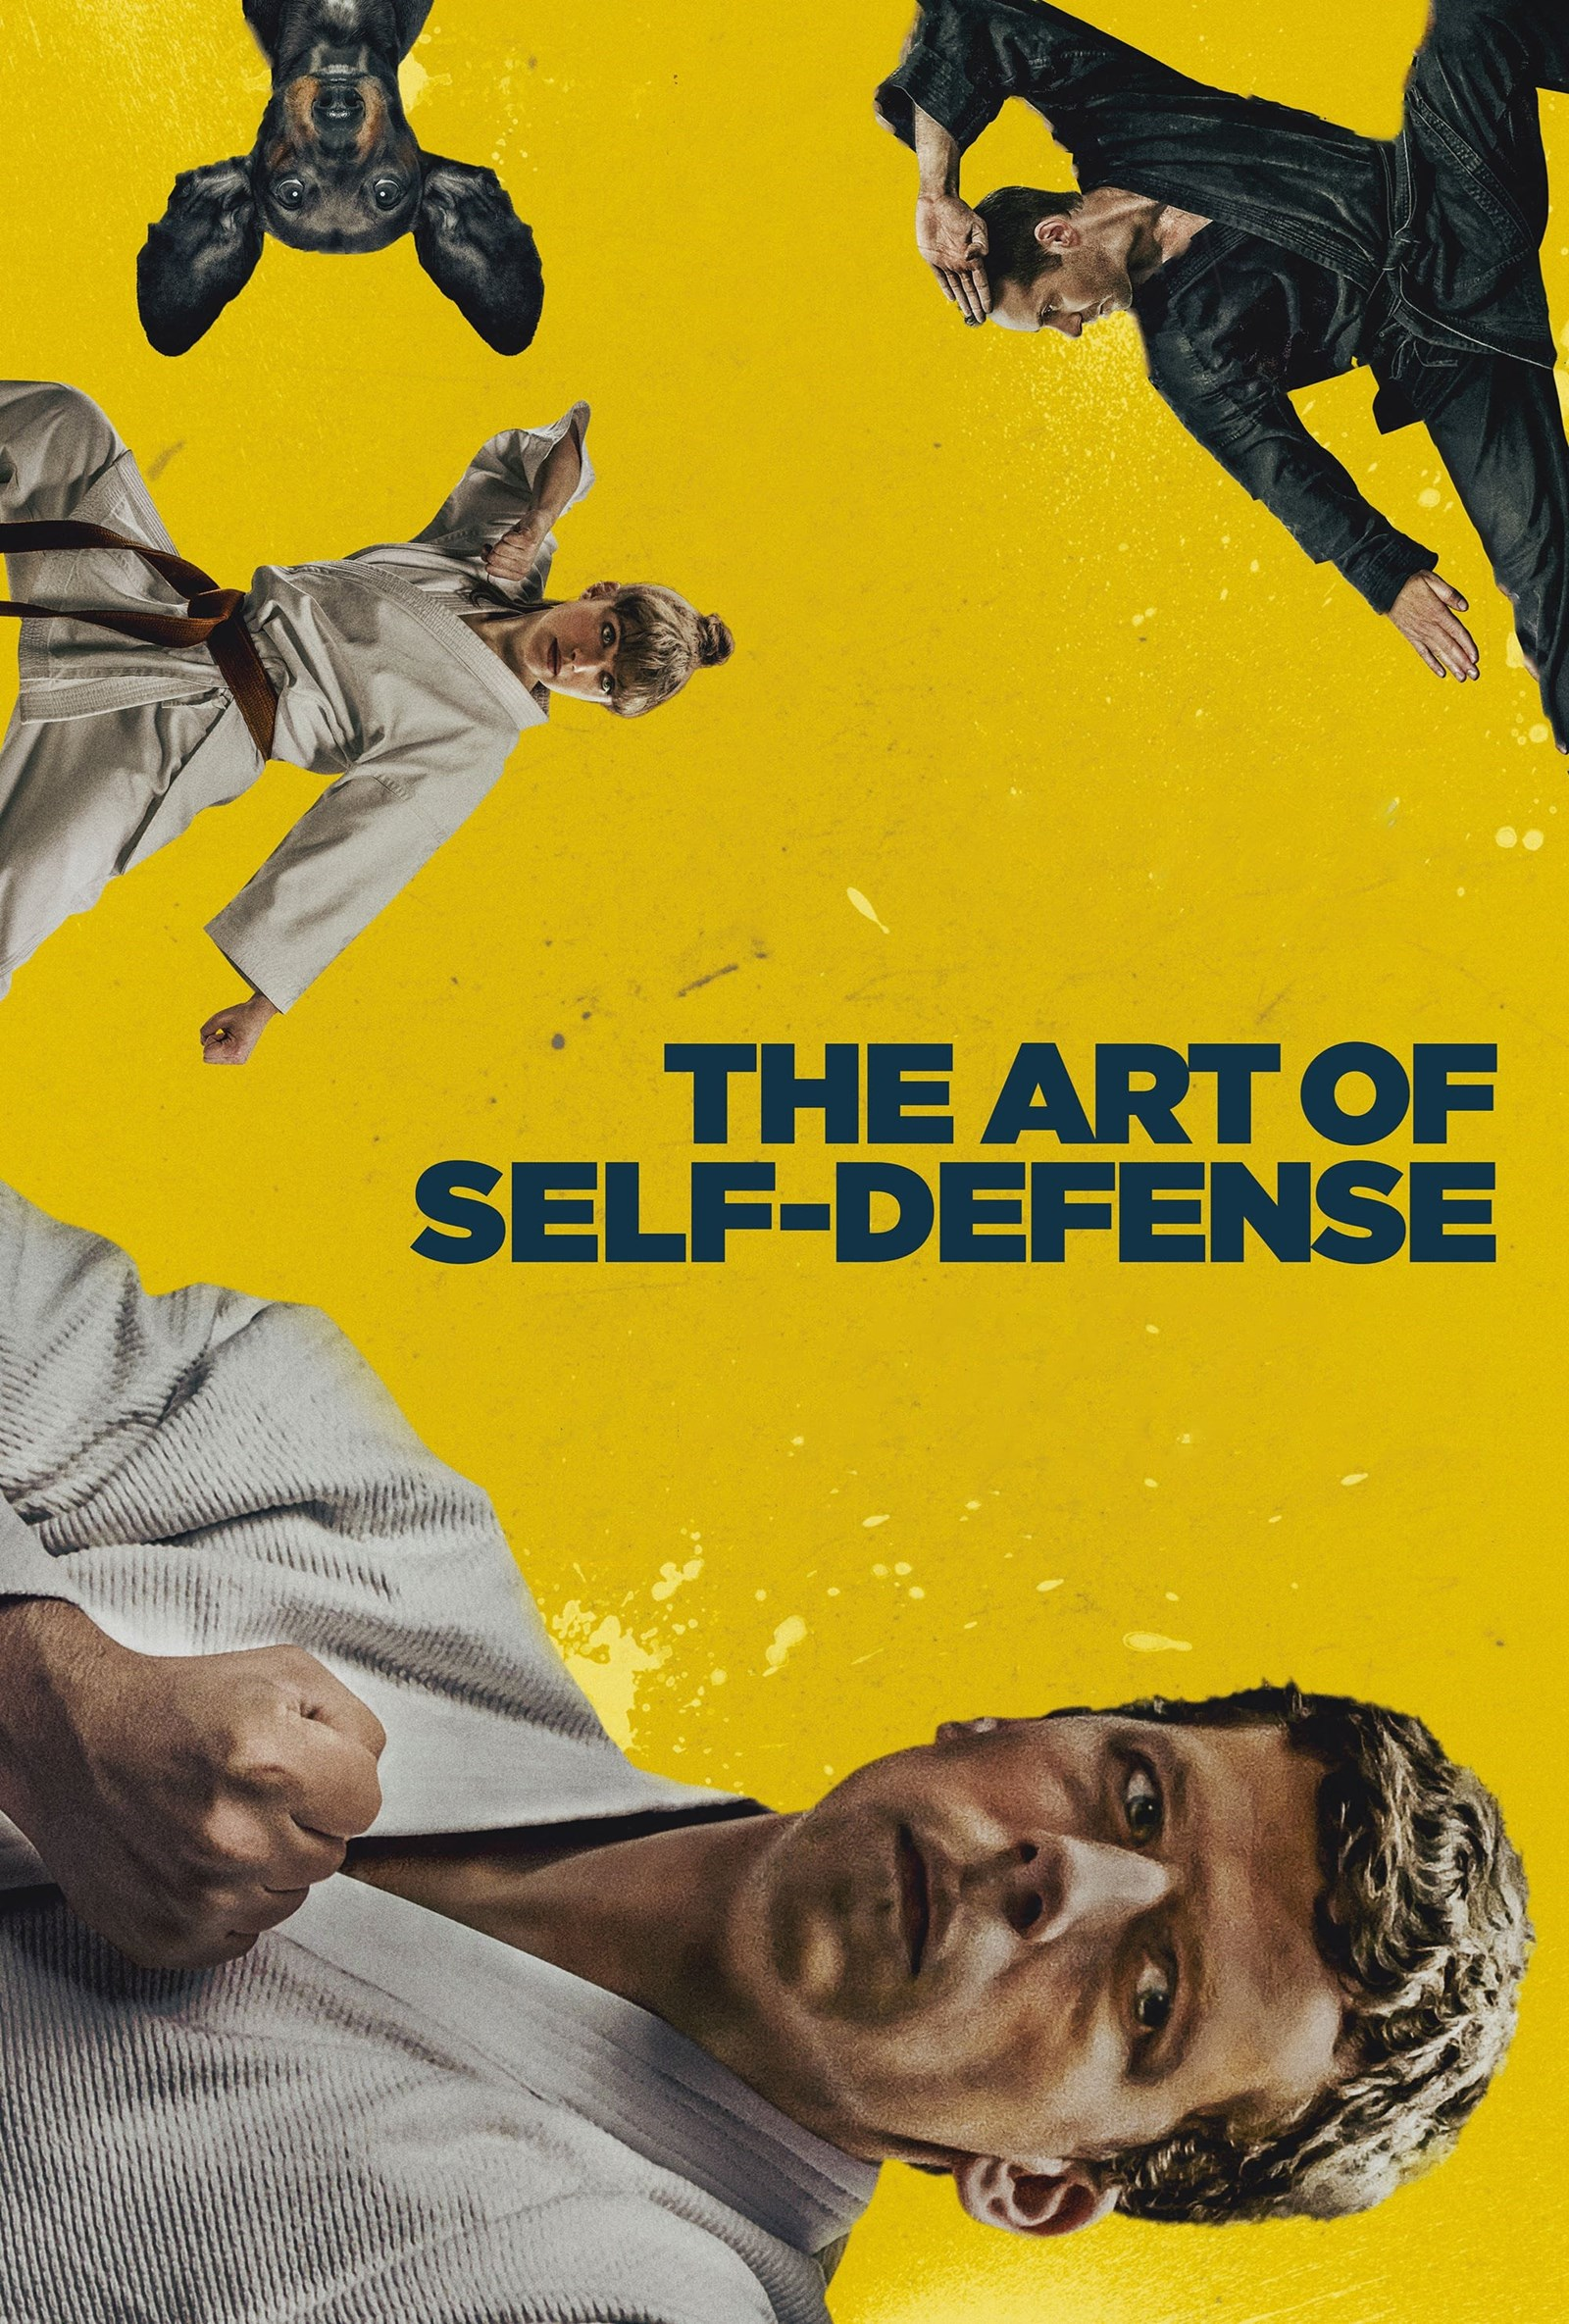 https://i.jeded.com/i/the-art-of-self-defense-2019.165399.jpg